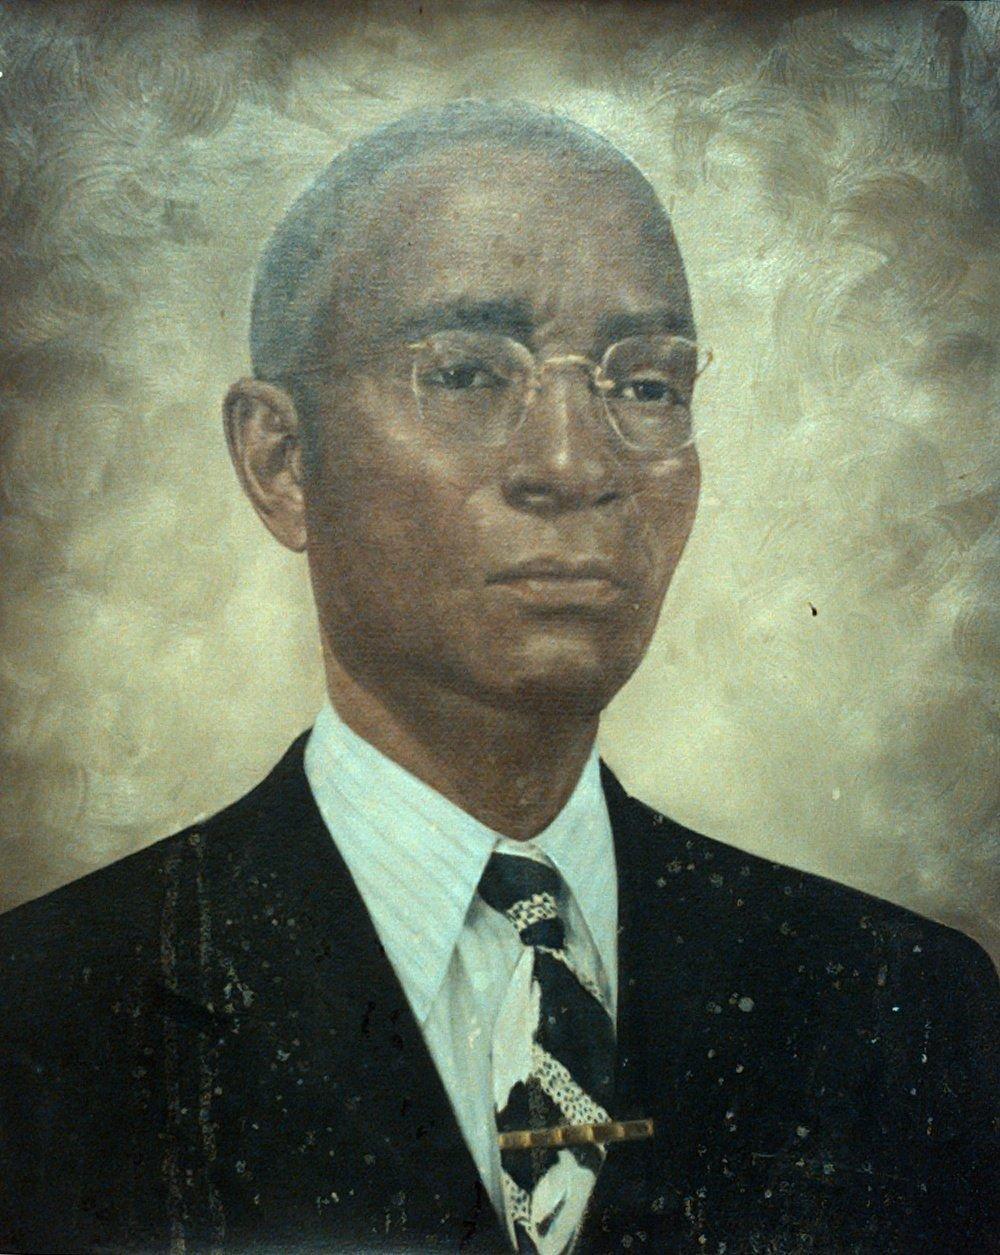 B.C Franklin